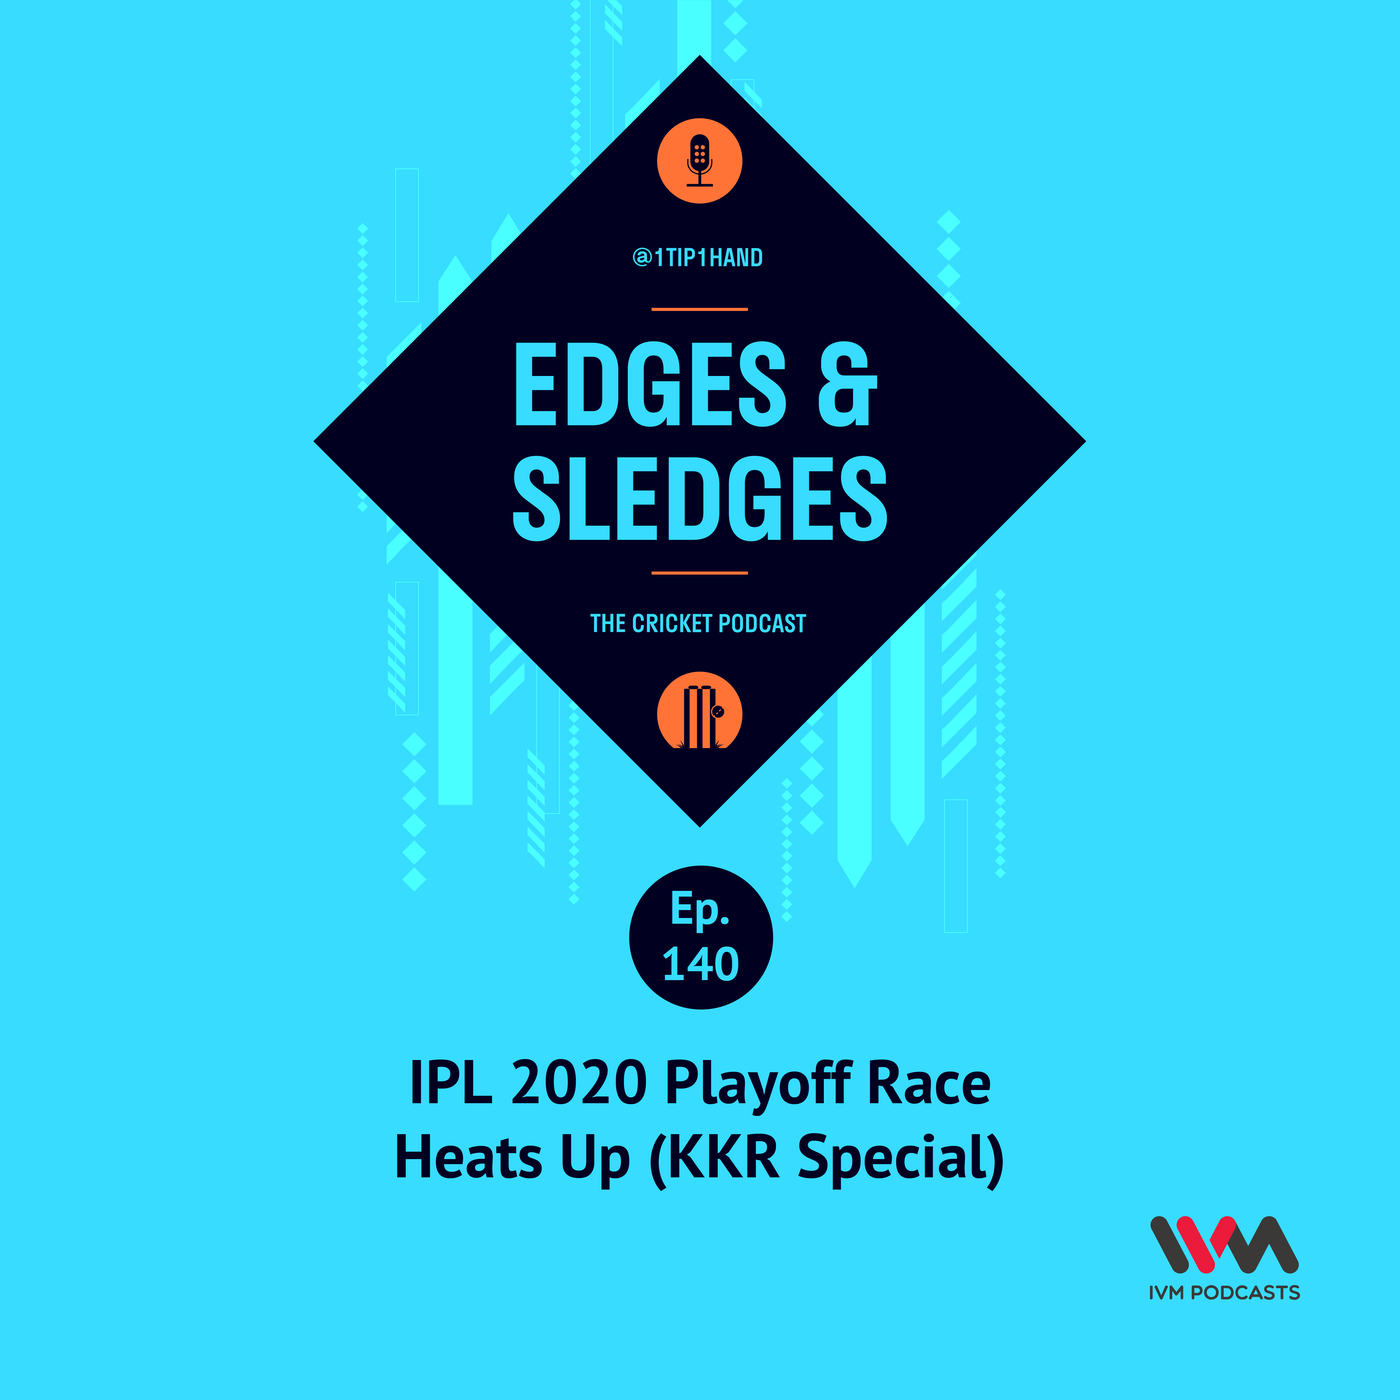 Ep. 140: IPL 2020 Playoff Race Heats Up (KKR Special)